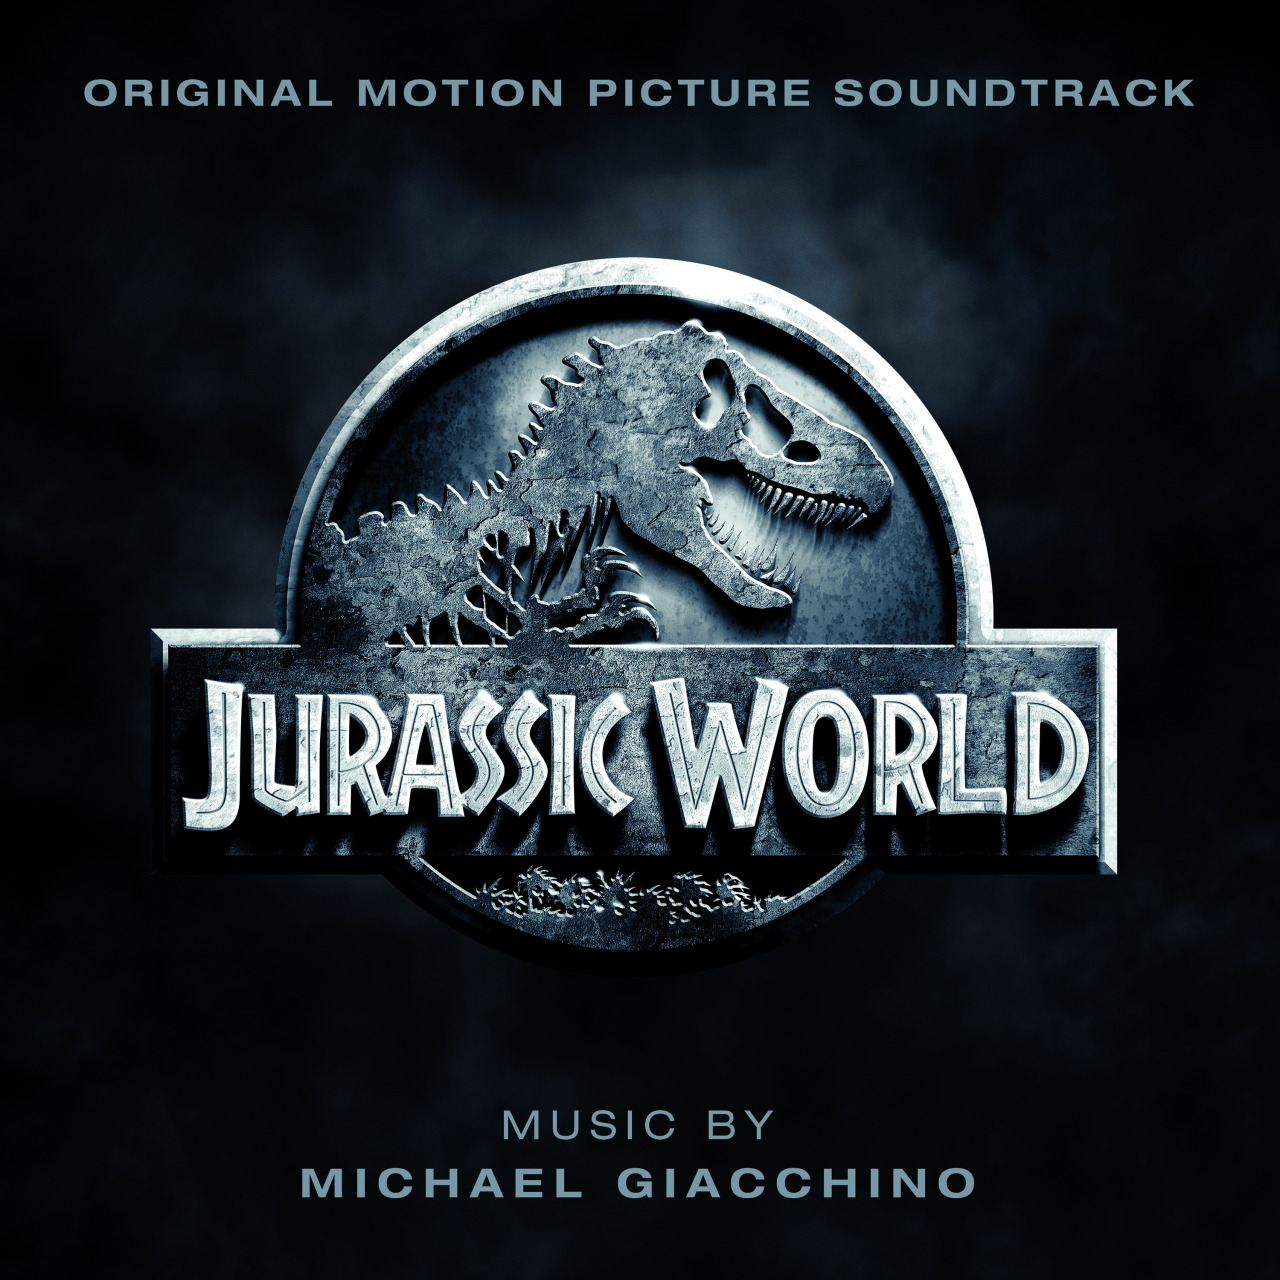 jurassic world (film score)   jurassic park wiki   fandom powered by